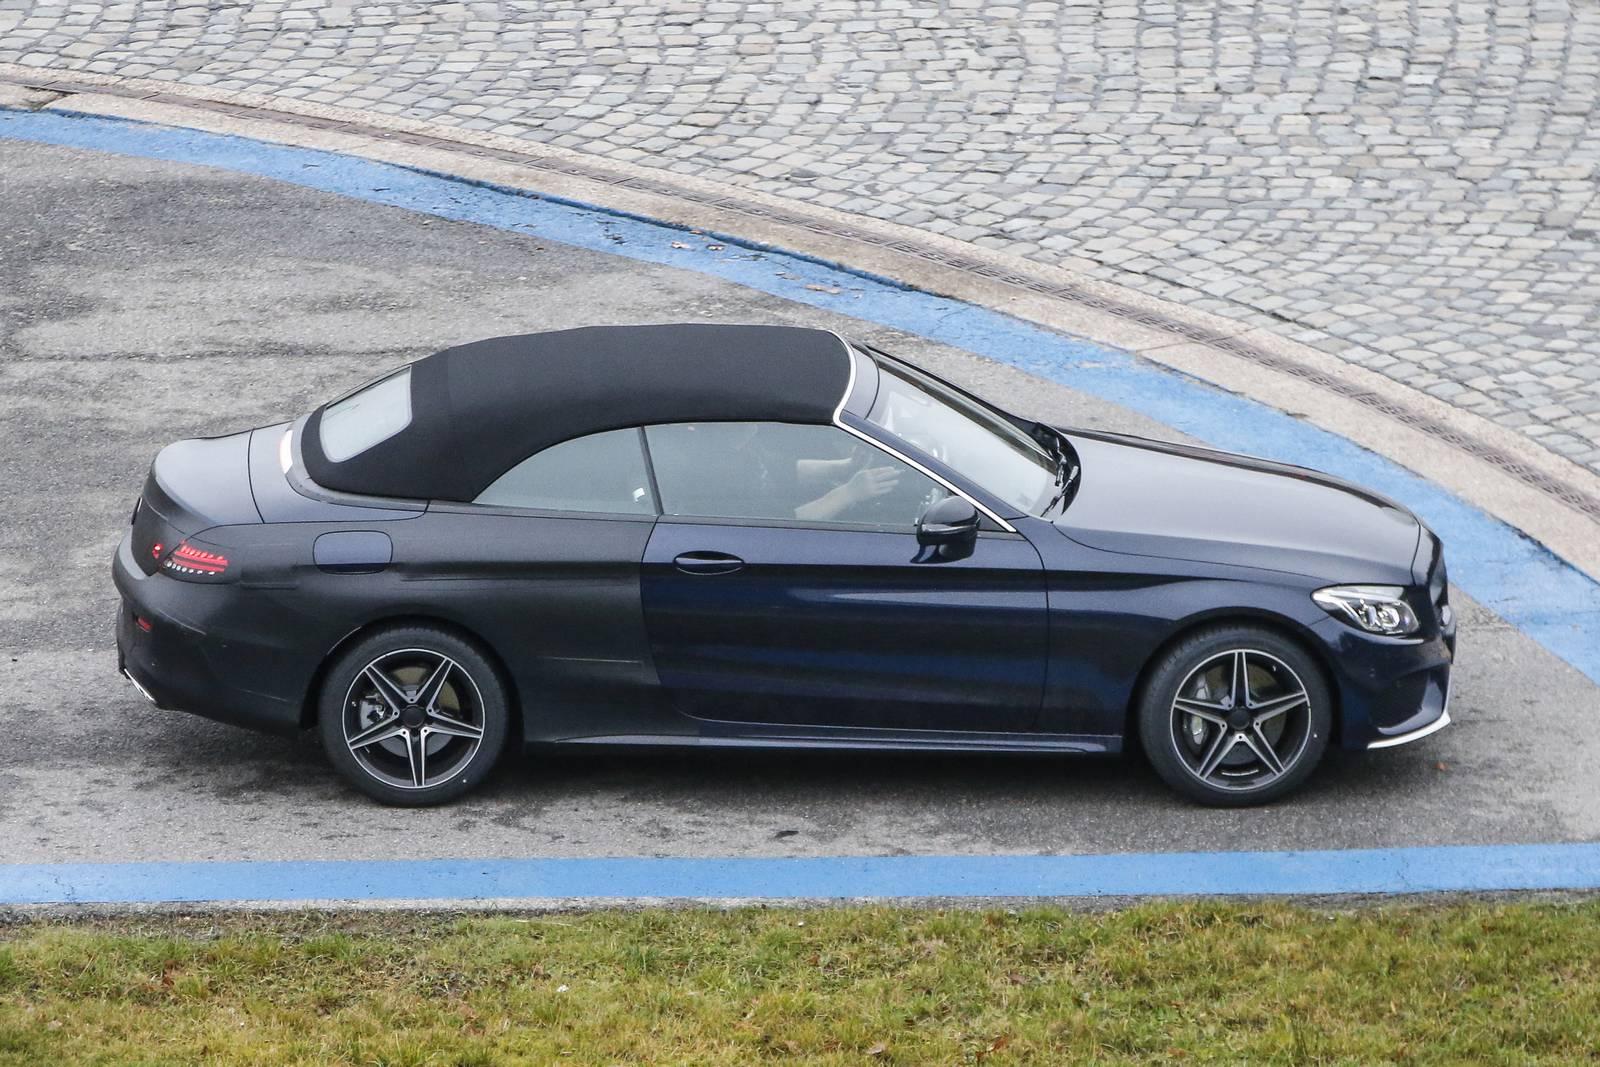 Spy images from drop top 2017 new mercedes c class prototype for Mercedes benz drop top